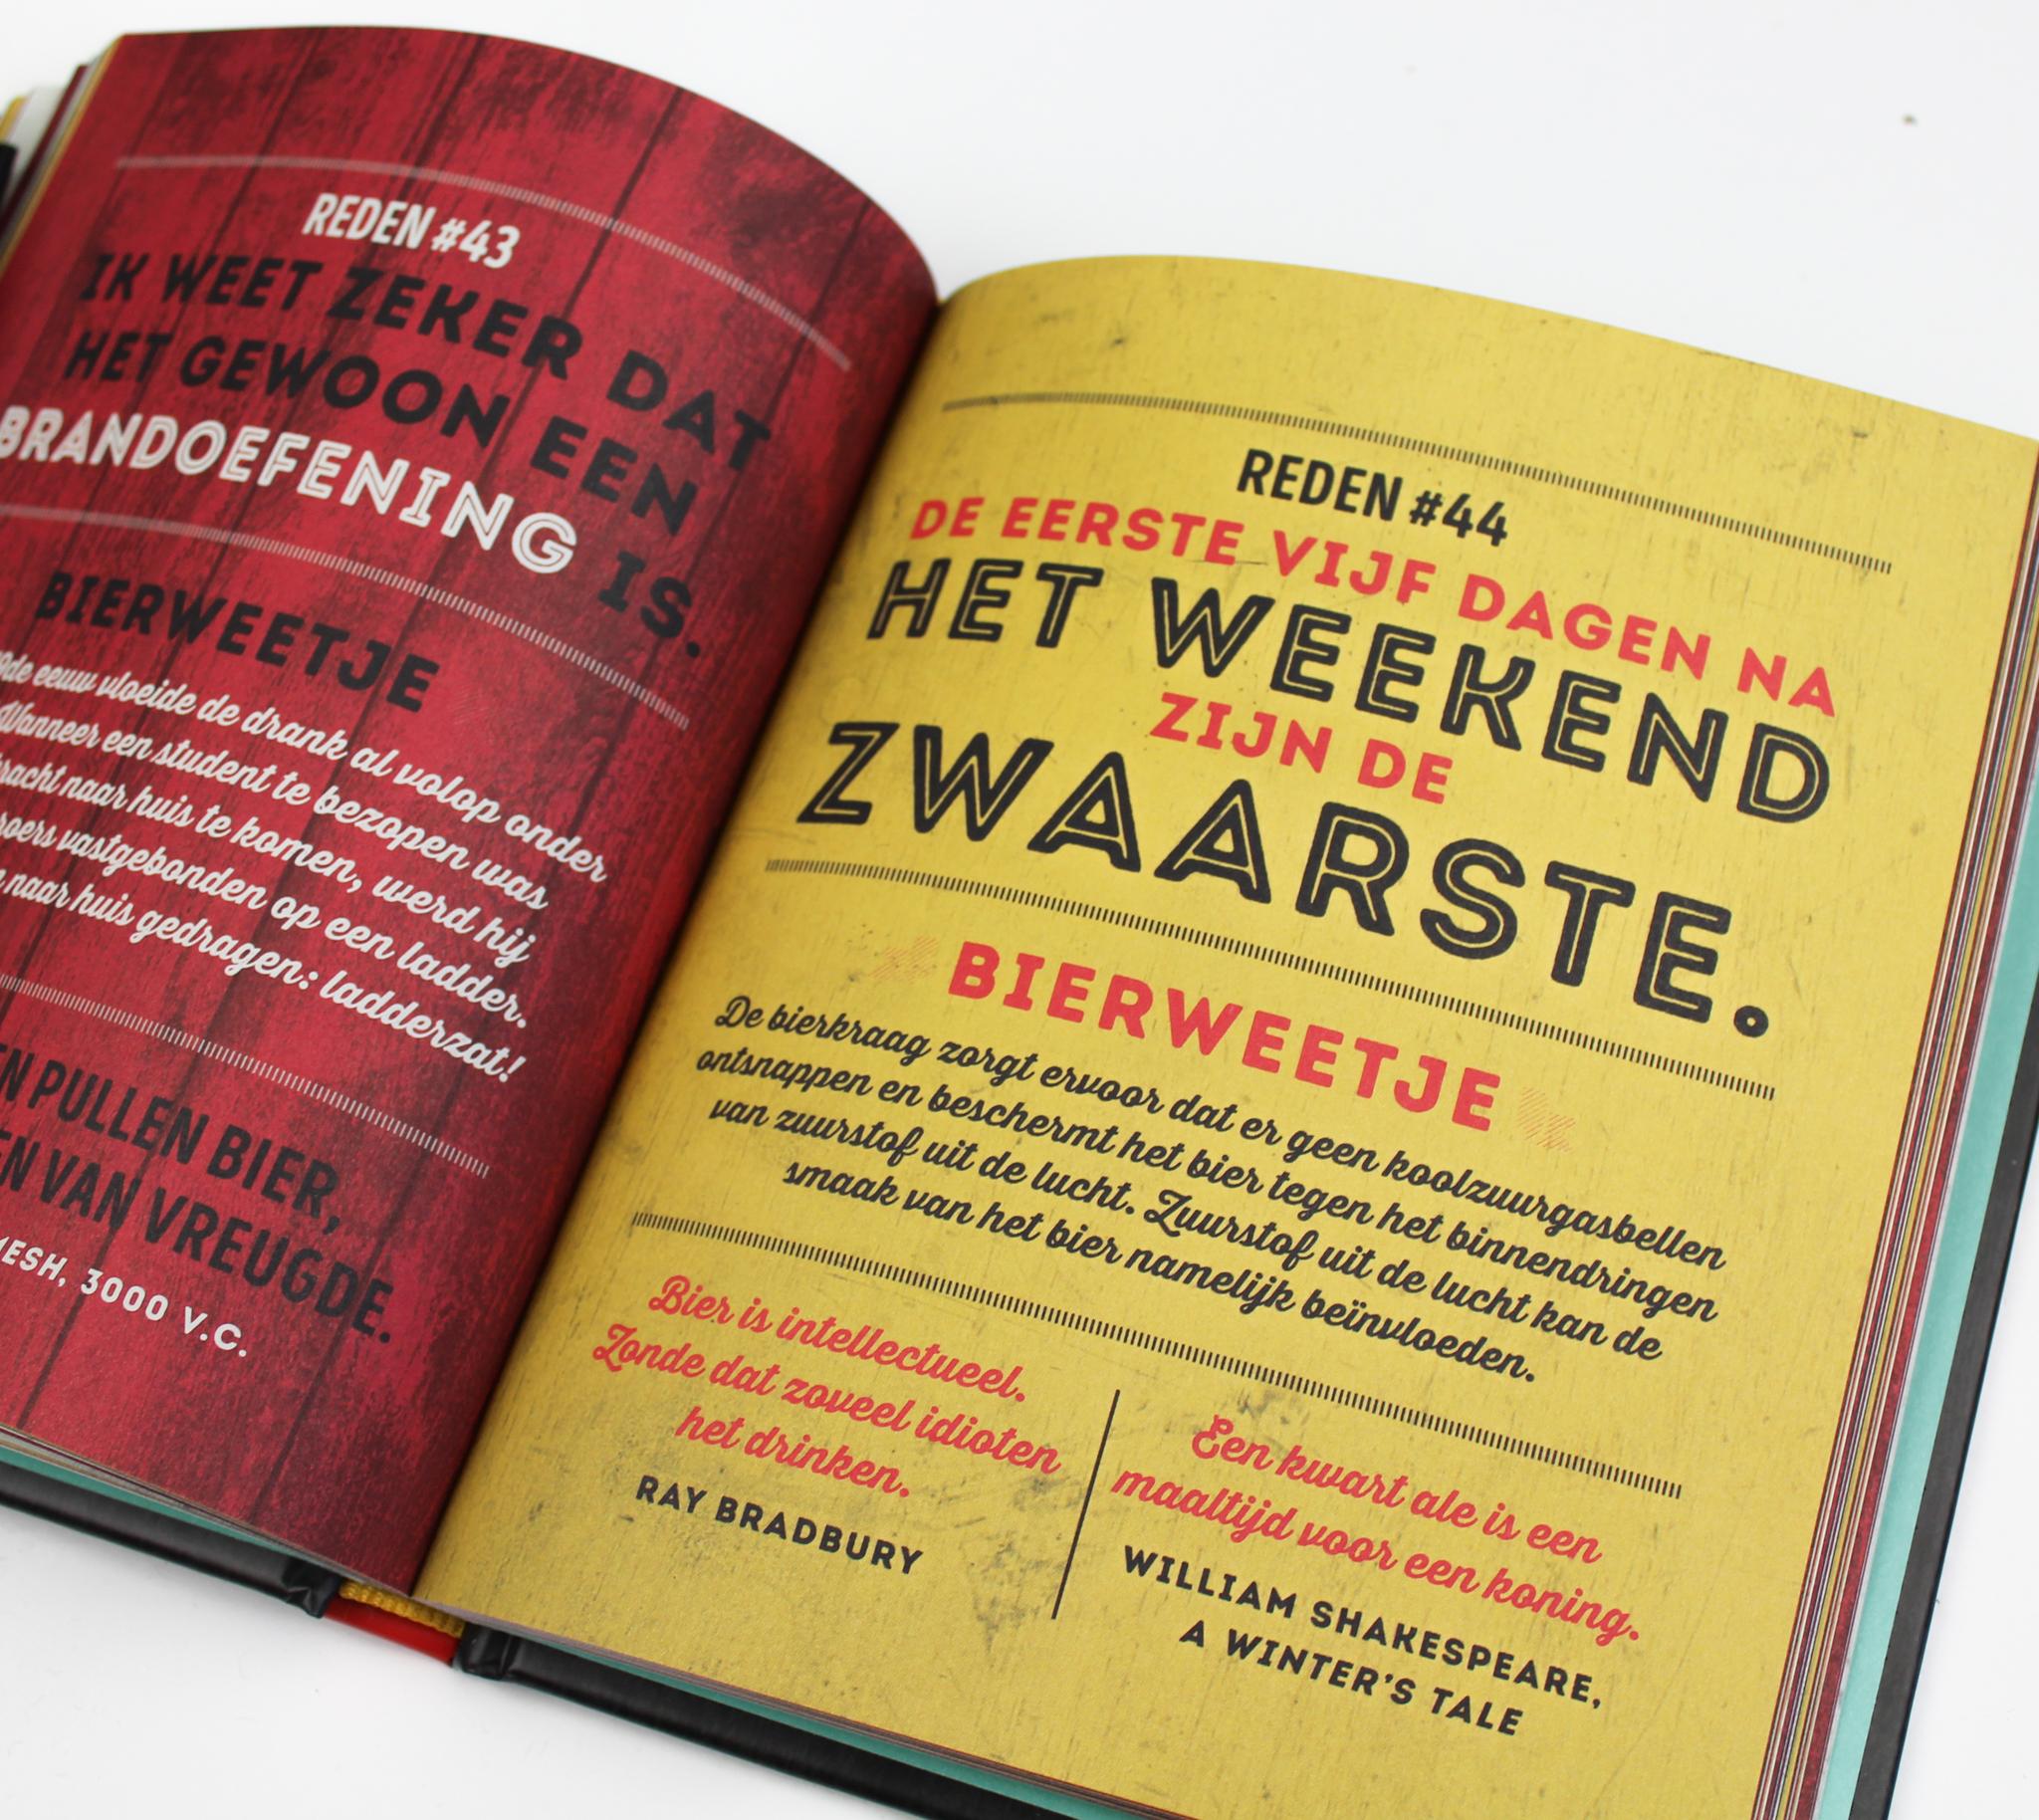 cadeau boek bier bierliefhebber ideefabriek feitjes